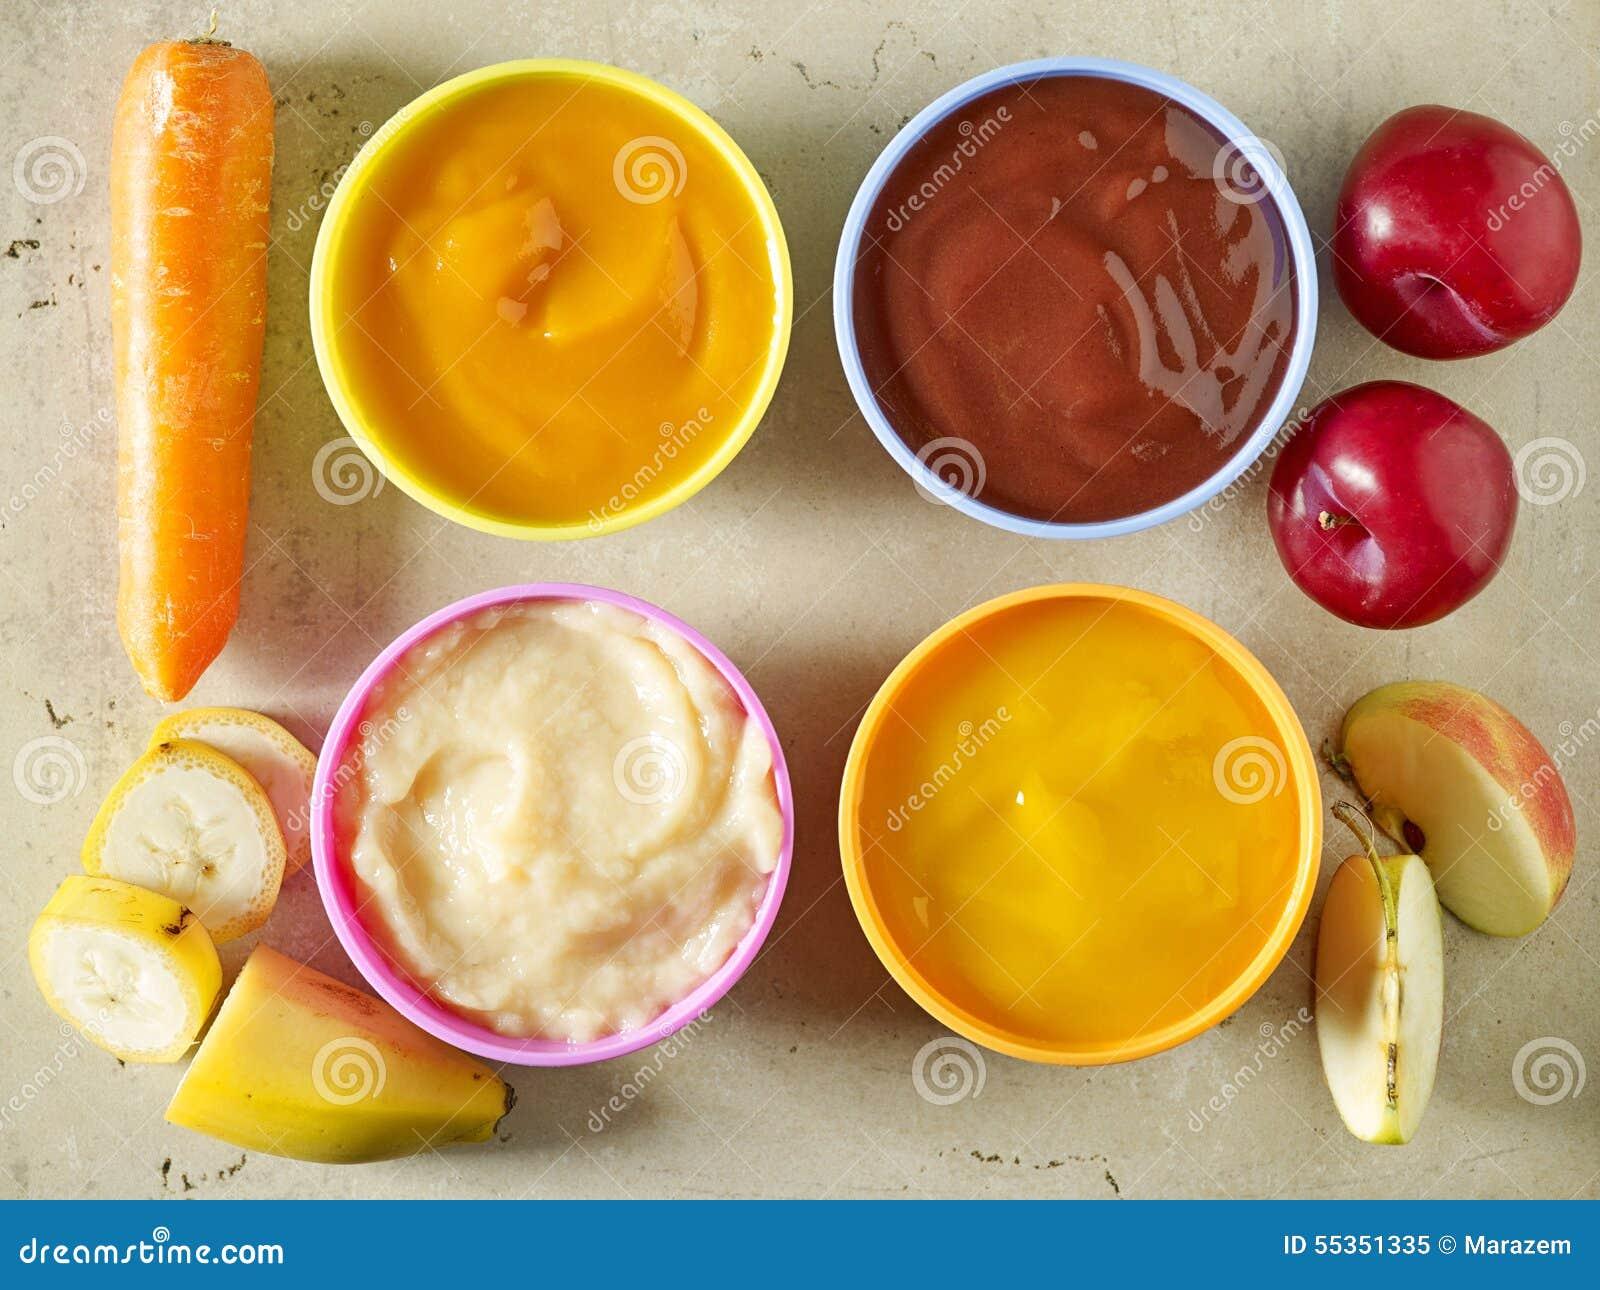 Baby Food Stock Photo - Image: 55351335